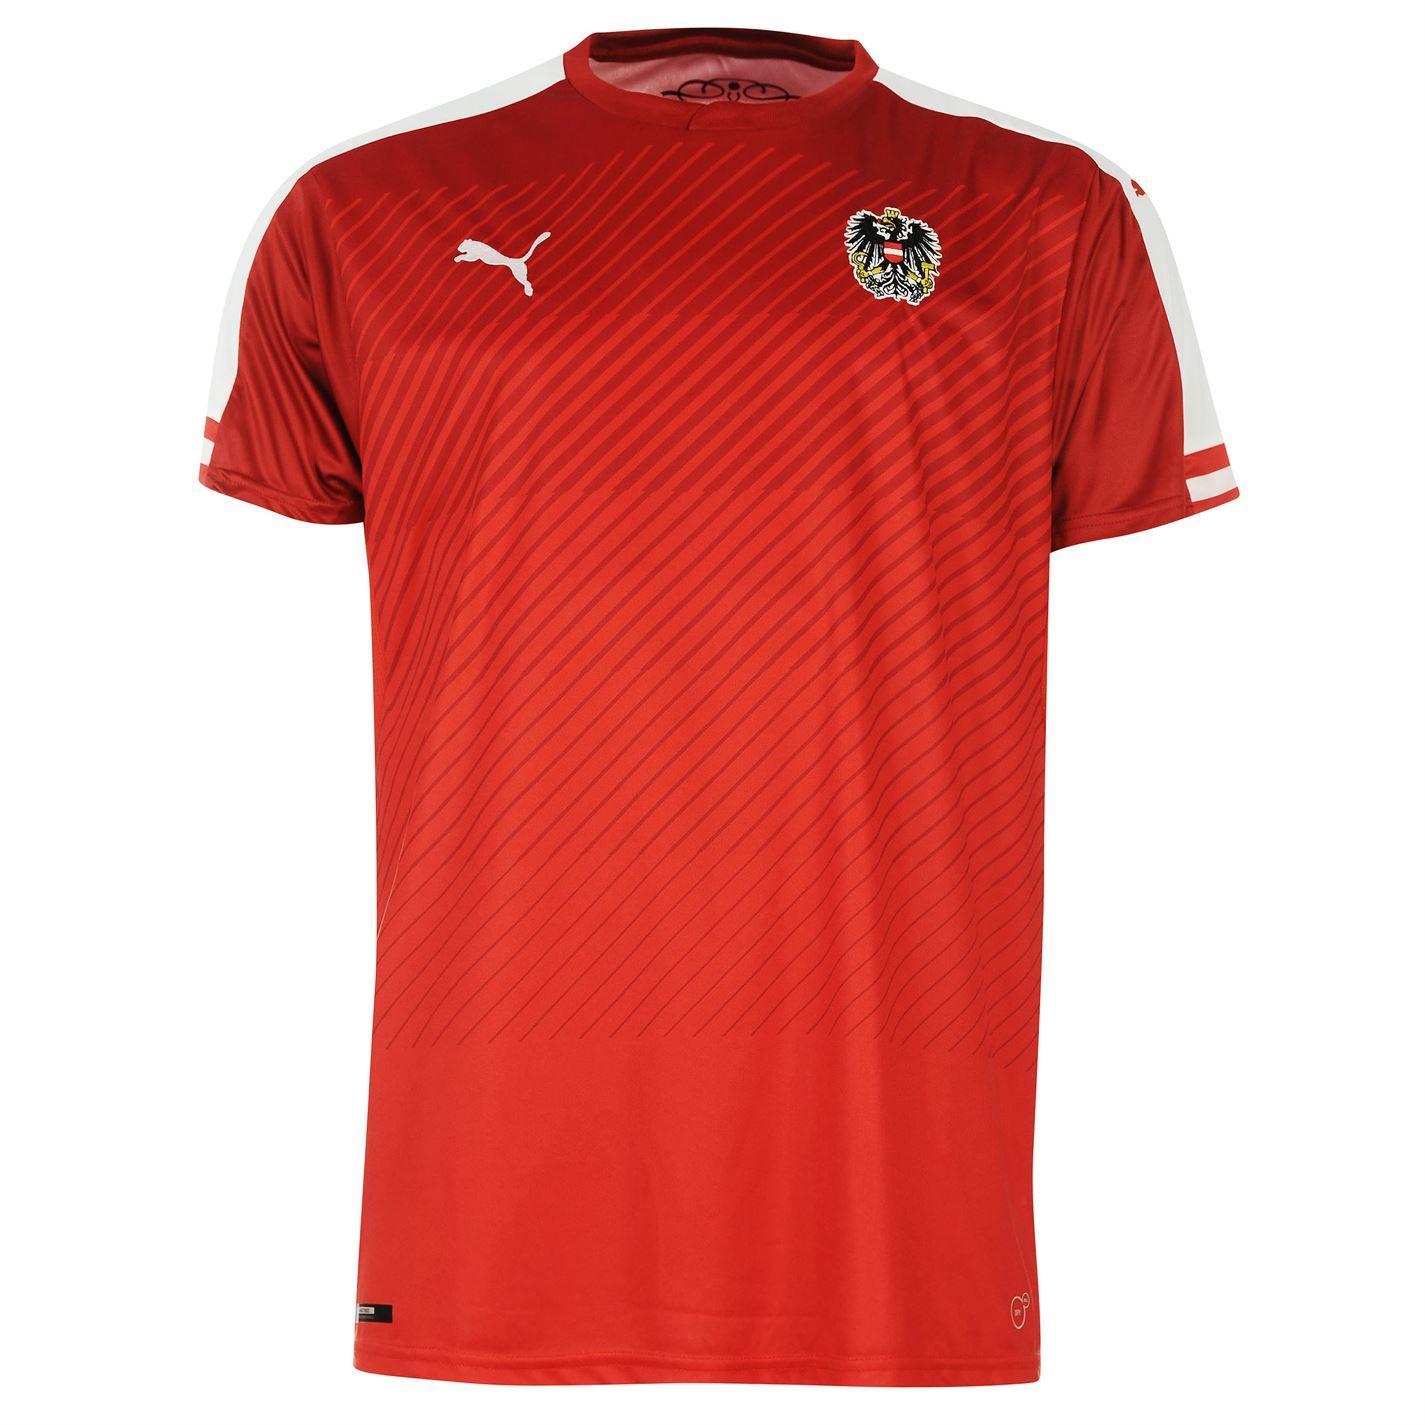 ... Puma Austria Home Jersey 2016 Mens Red White Football Soccer Top Shirt  ... d5433d8db